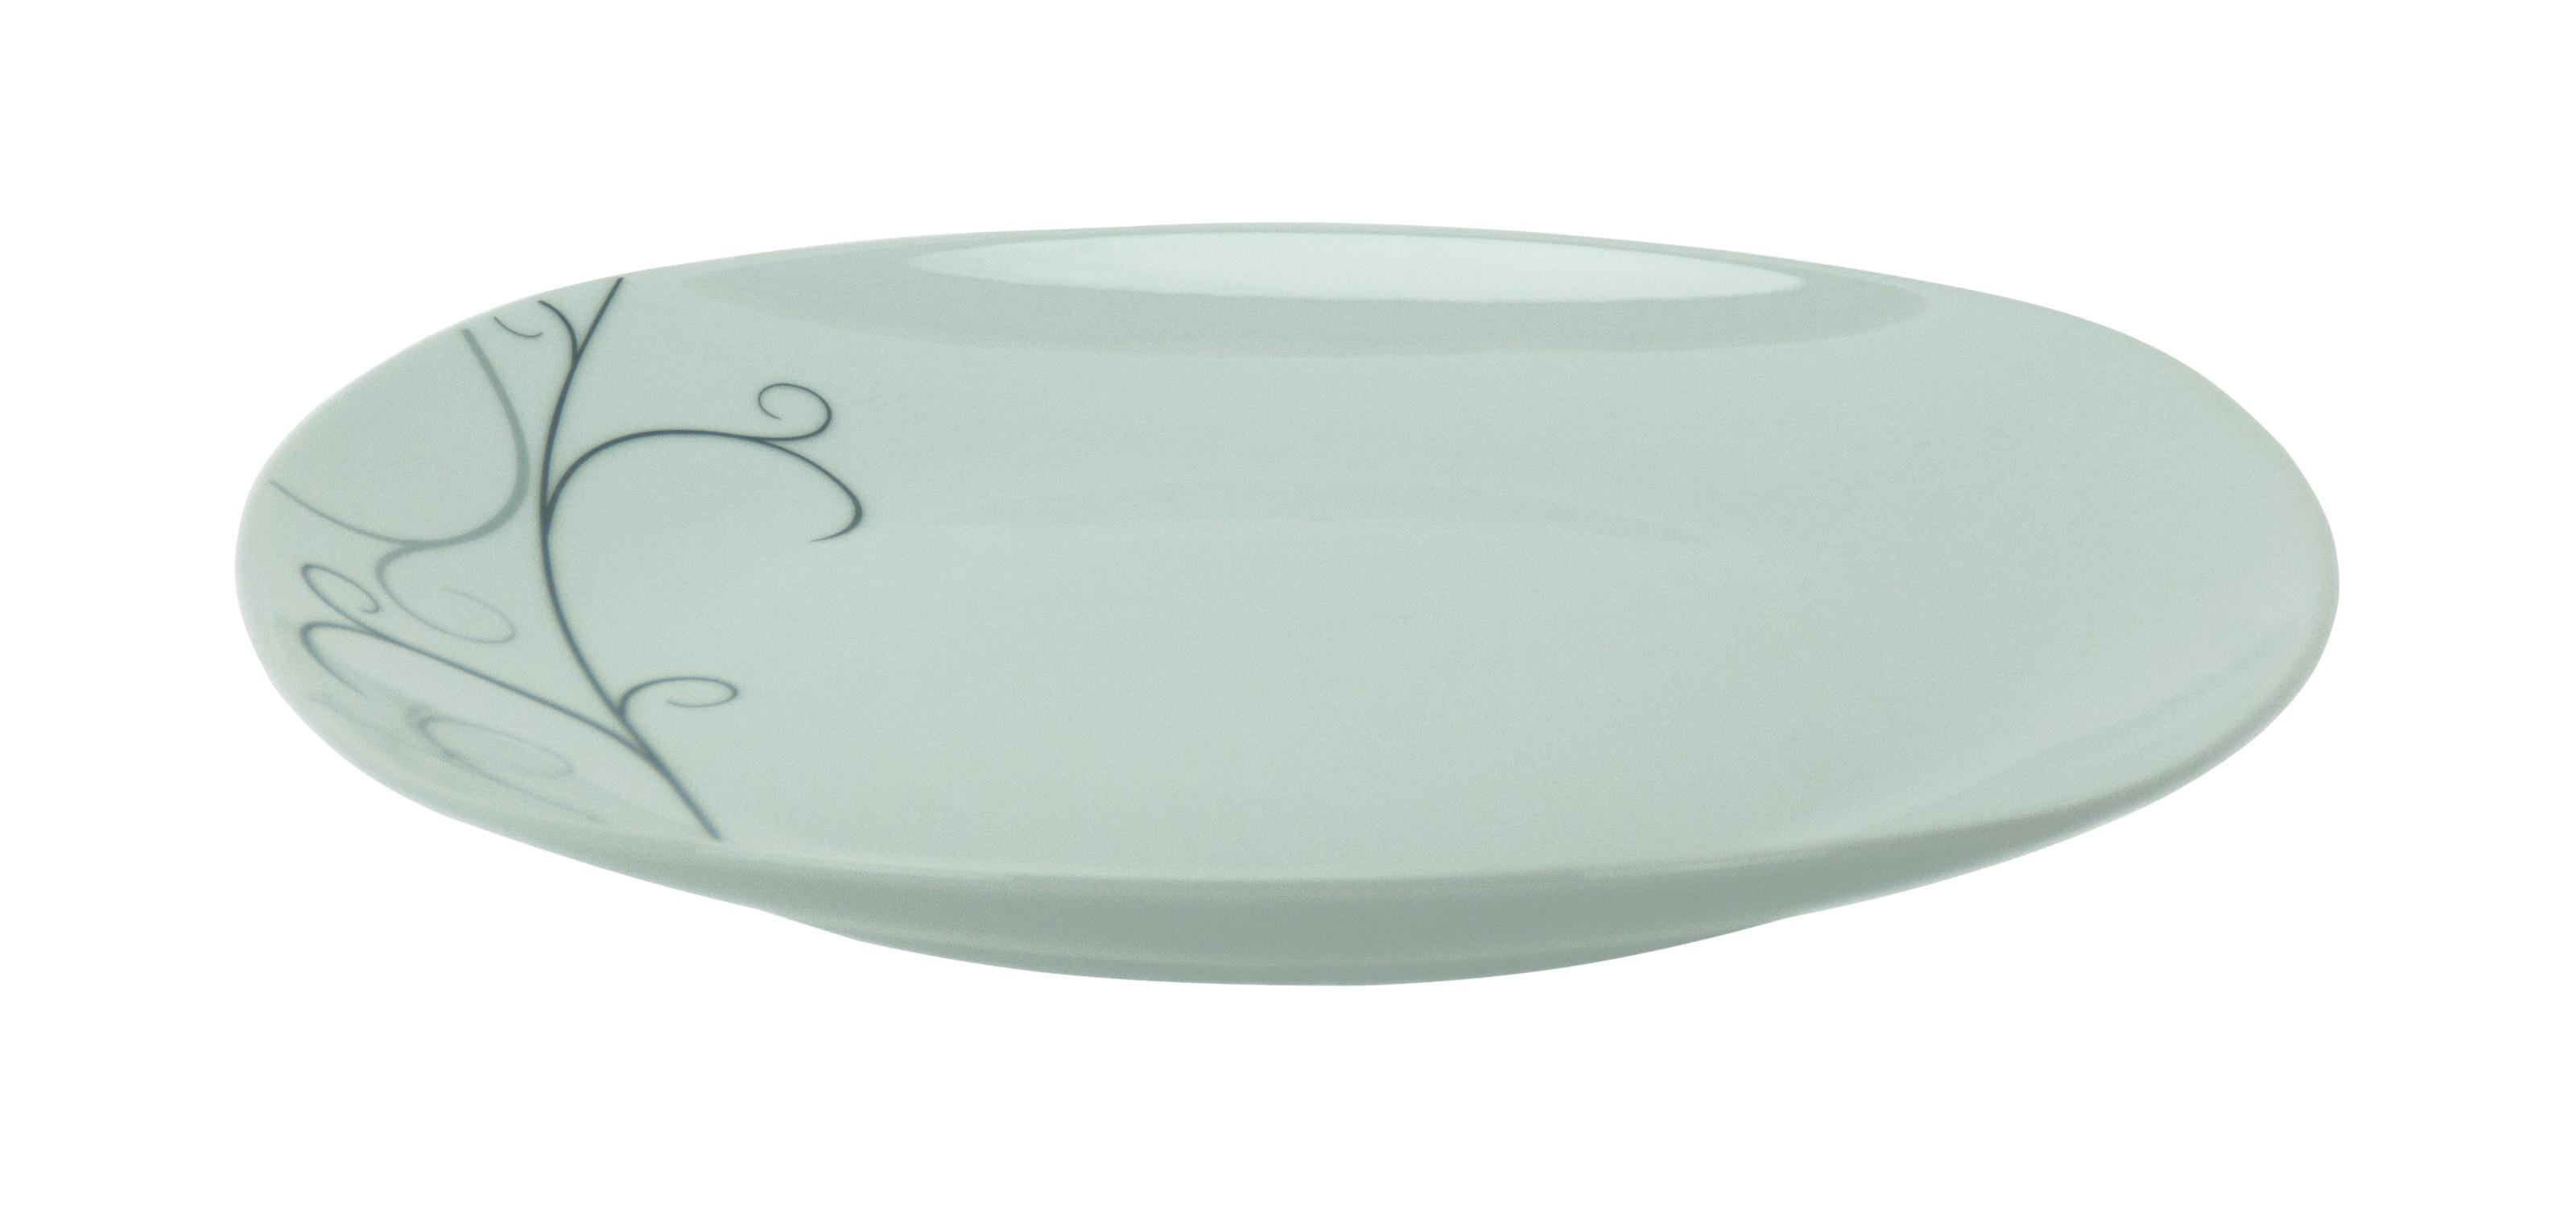 tafelservice vita 12 tlg wei mit farbigem dekor f r 6 personen porzellan tafelservice mit dekor. Black Bedroom Furniture Sets. Home Design Ideas